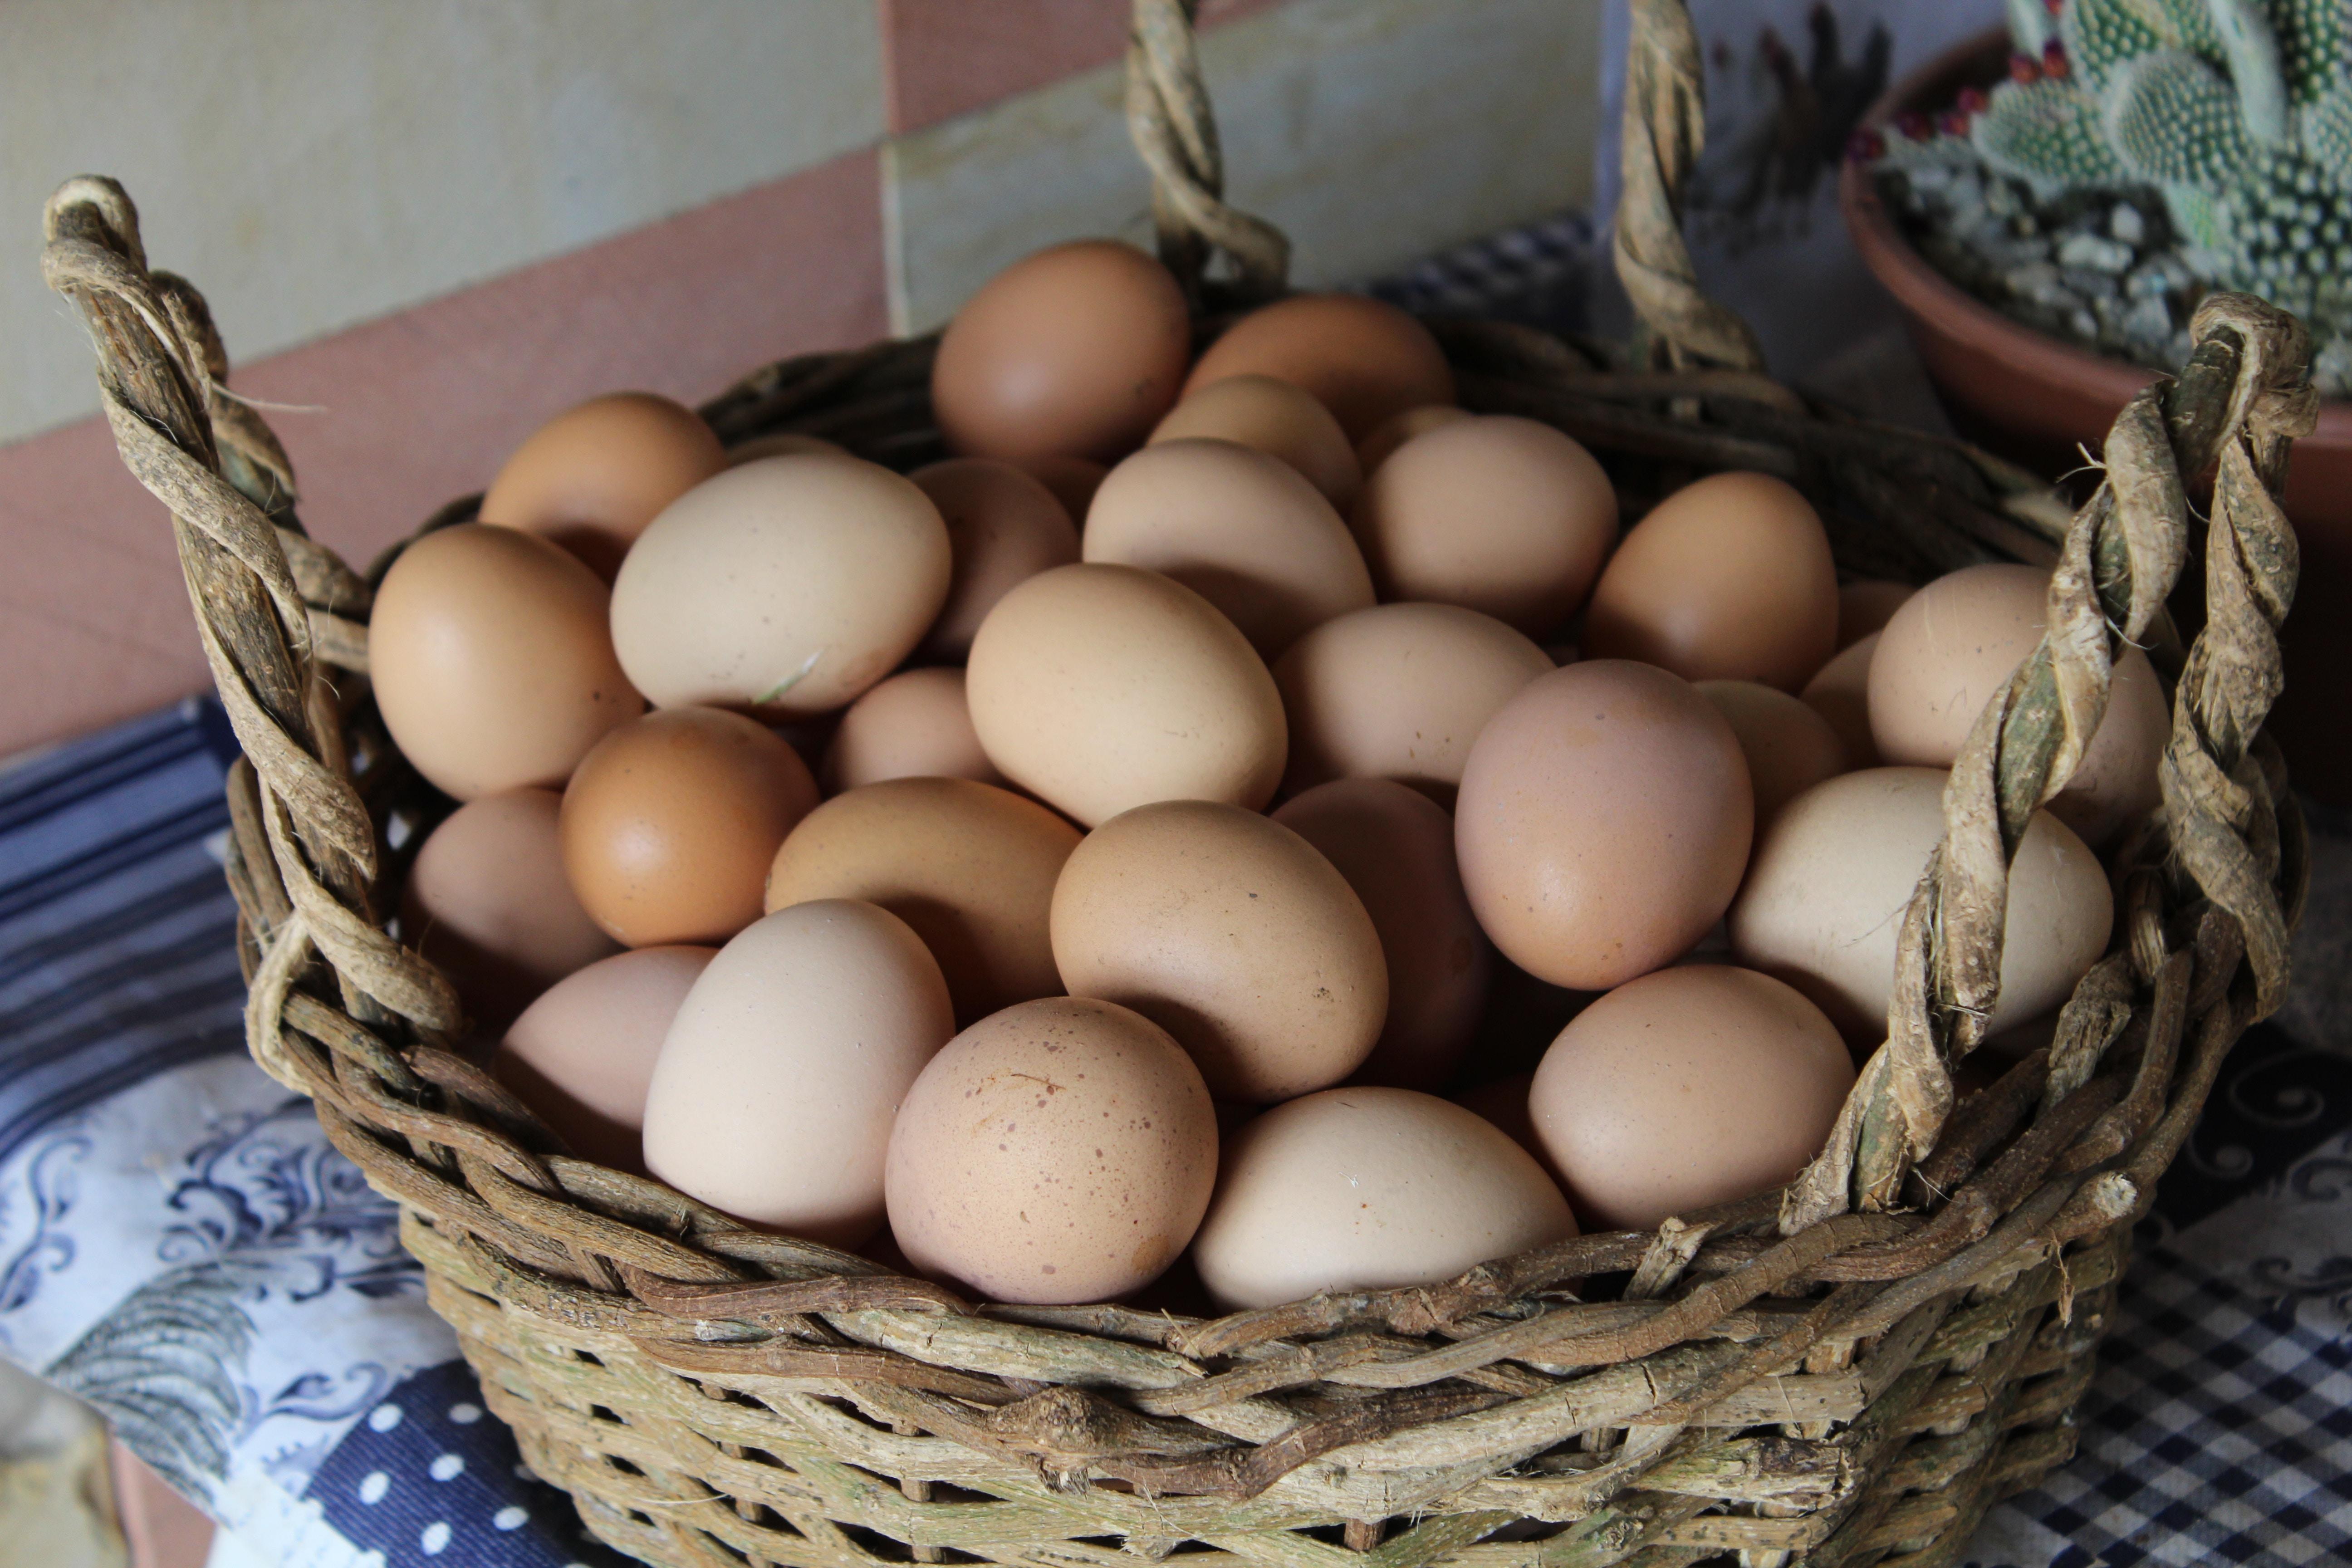 Fresh eggs from Las Vegas? chickens?